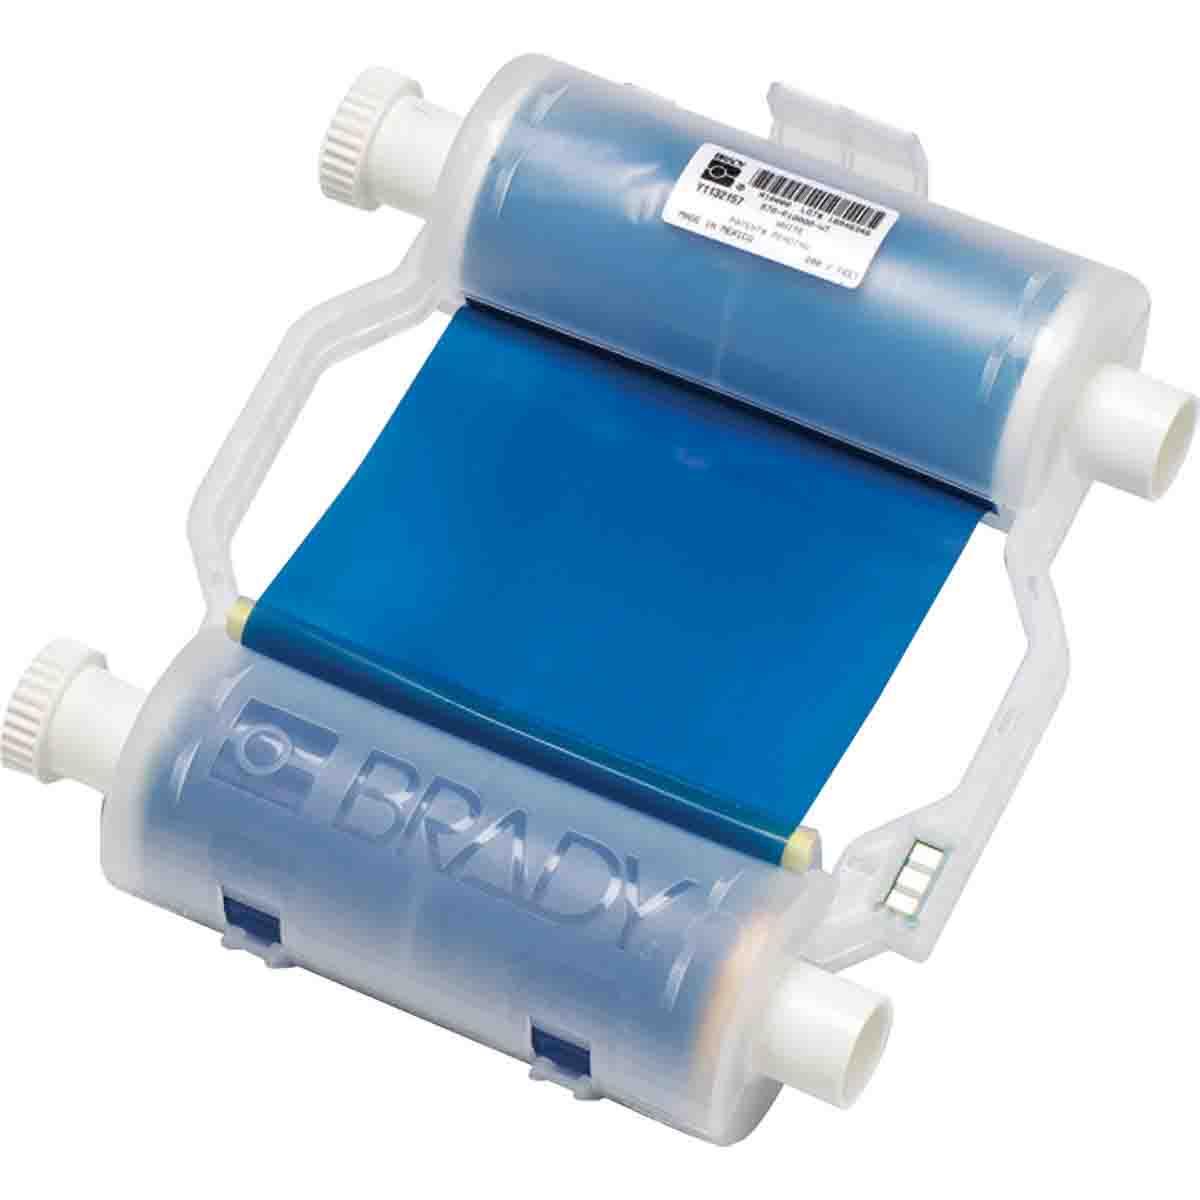 Brady® B30-R10000-BL B30 R10000 1-Color 1-Stage Heavy Duty Printer Ribbon, 200 ft L x 4.33 in W, Resin, Blue